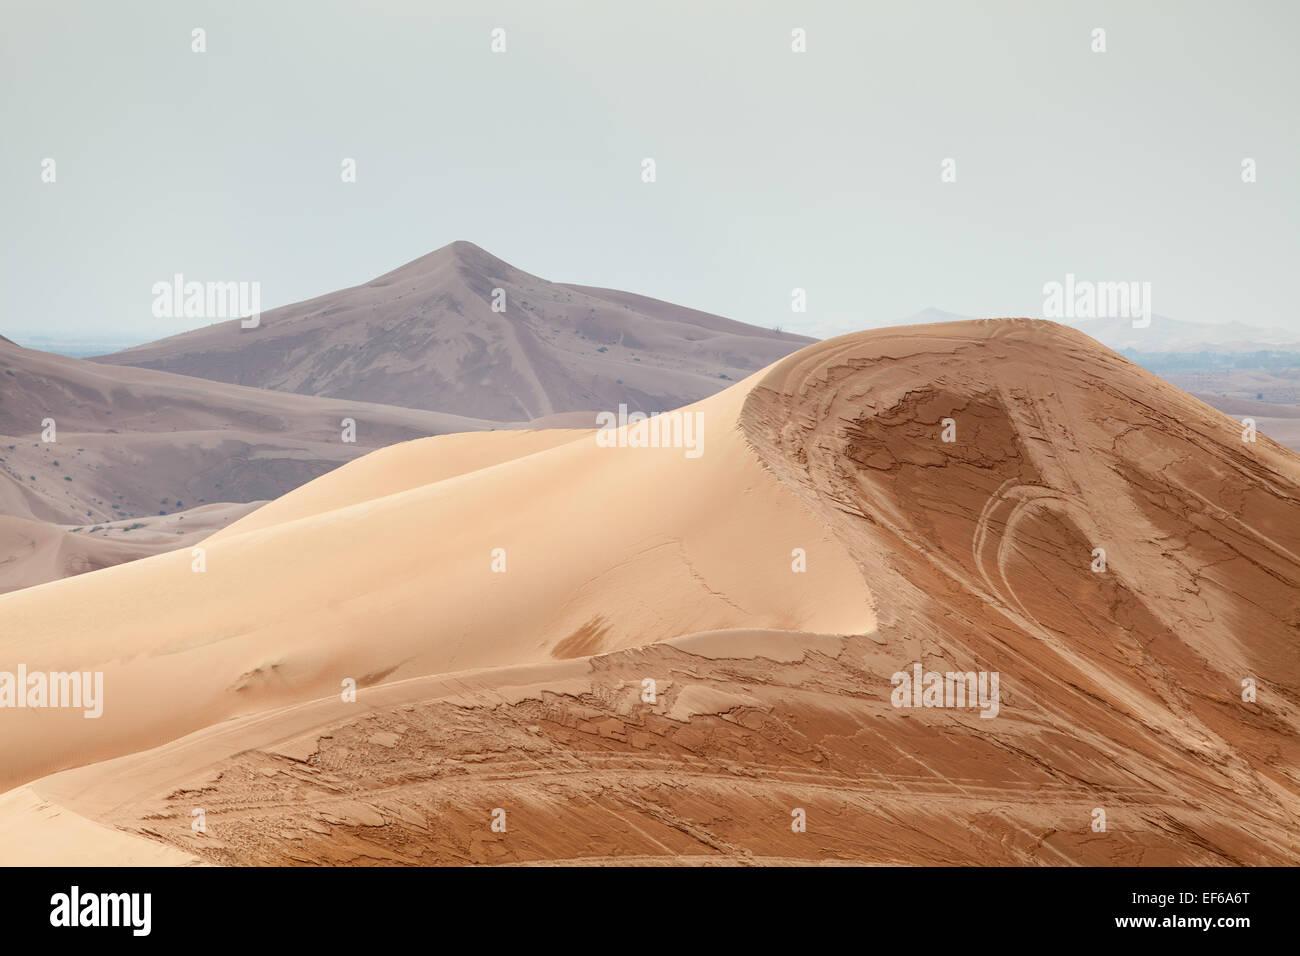 Sand dunes at the desert of arabian peninsula stock photo royalty sand dunes at the desert of arabian peninsula sciox Images